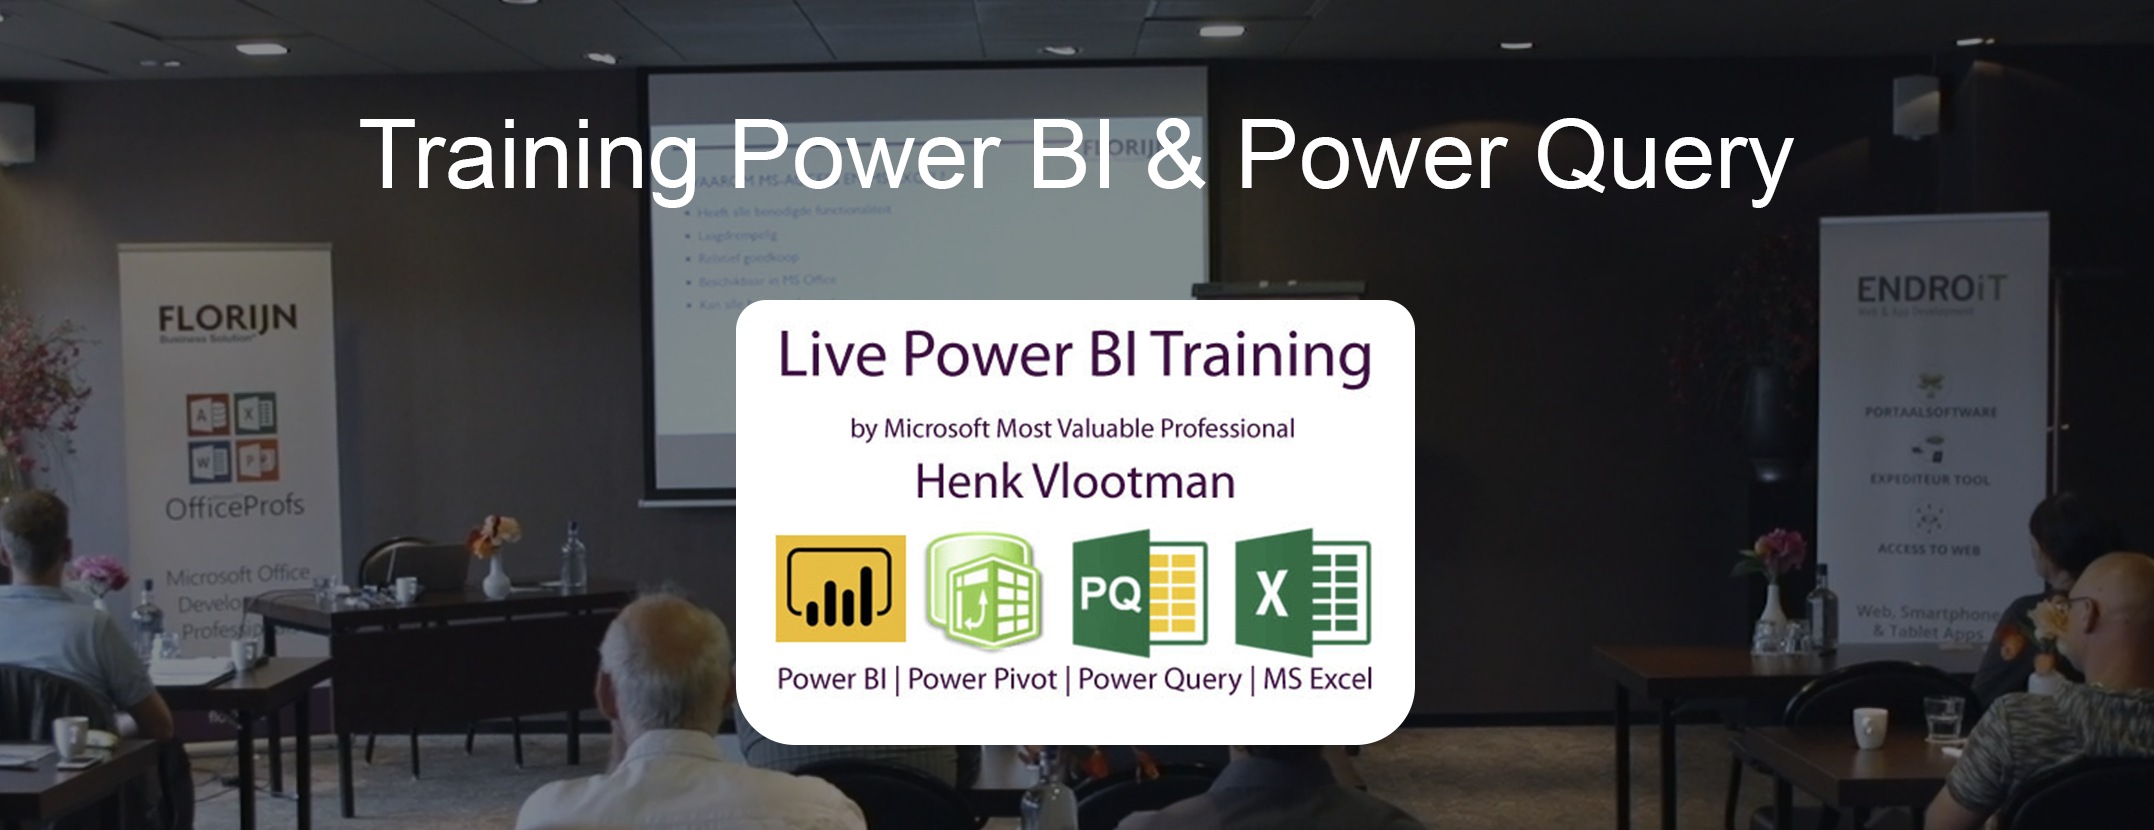 Training Power BI & Power Query